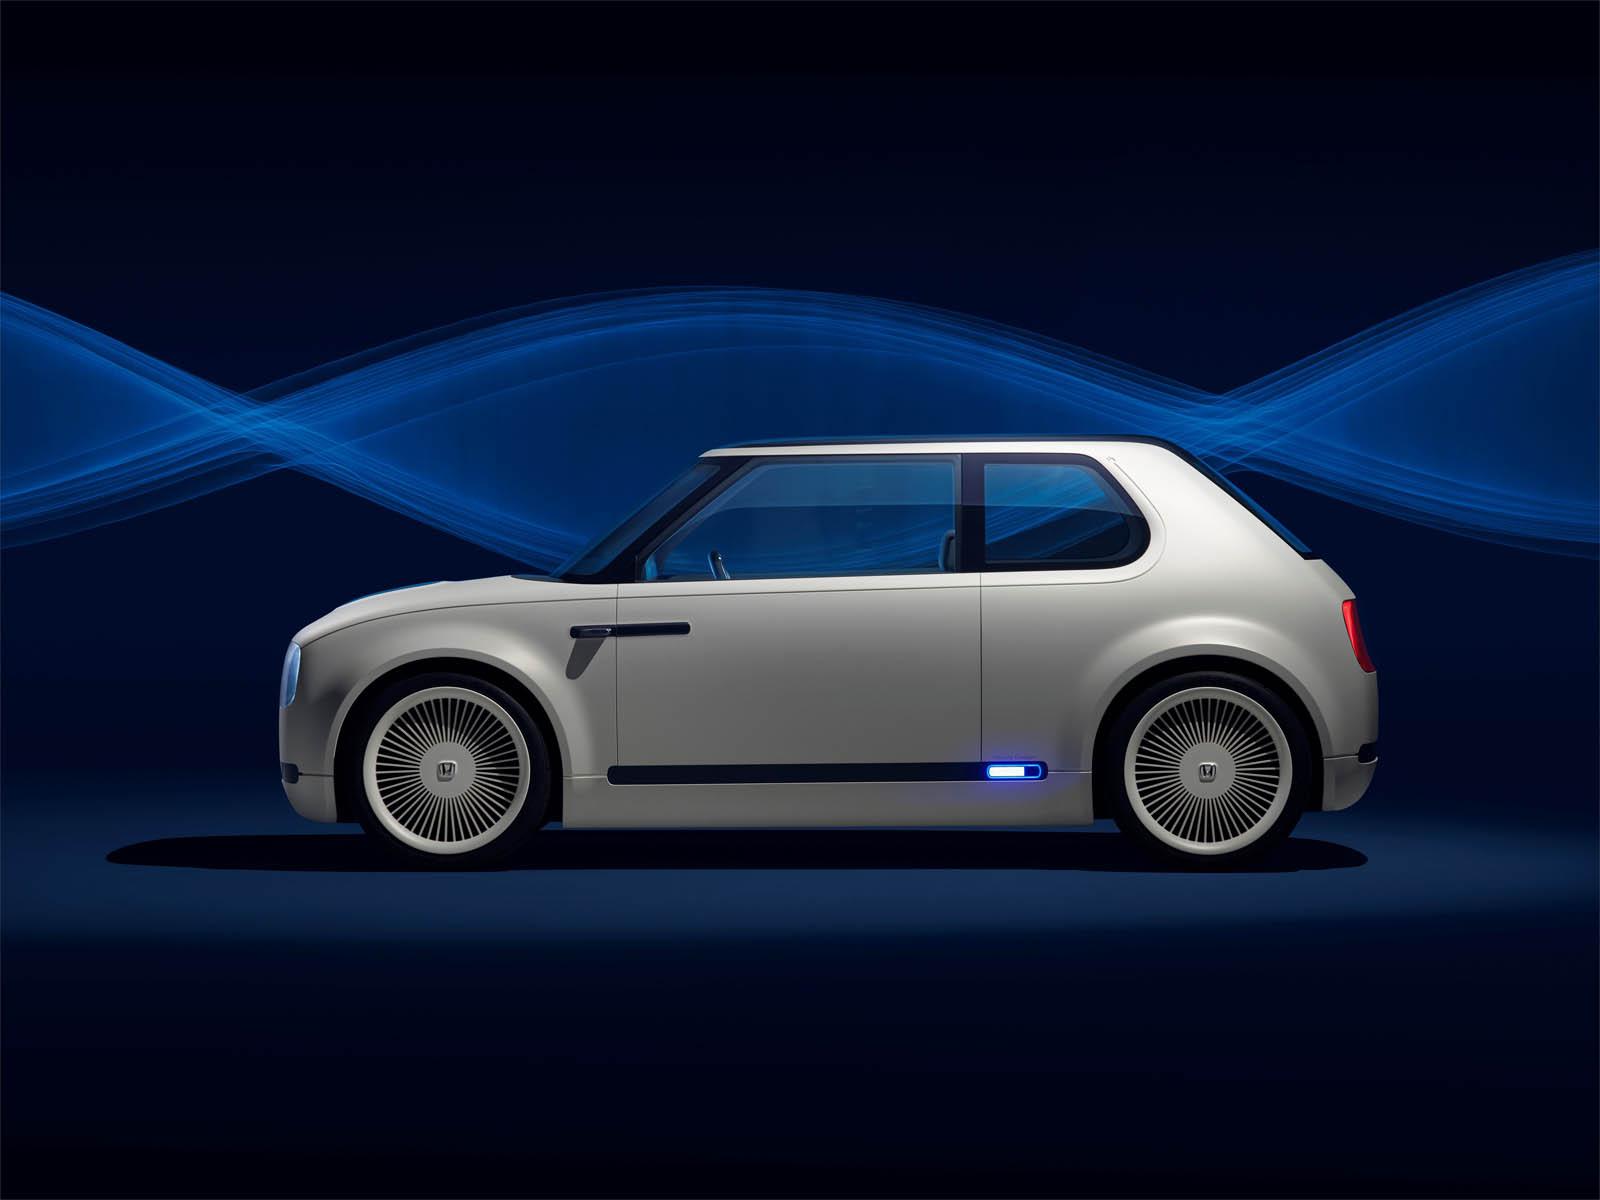 113872_Honda_Urban_EV_Concept_unveiled_at_the_Frankfurt_Motor_Show copy.jpg